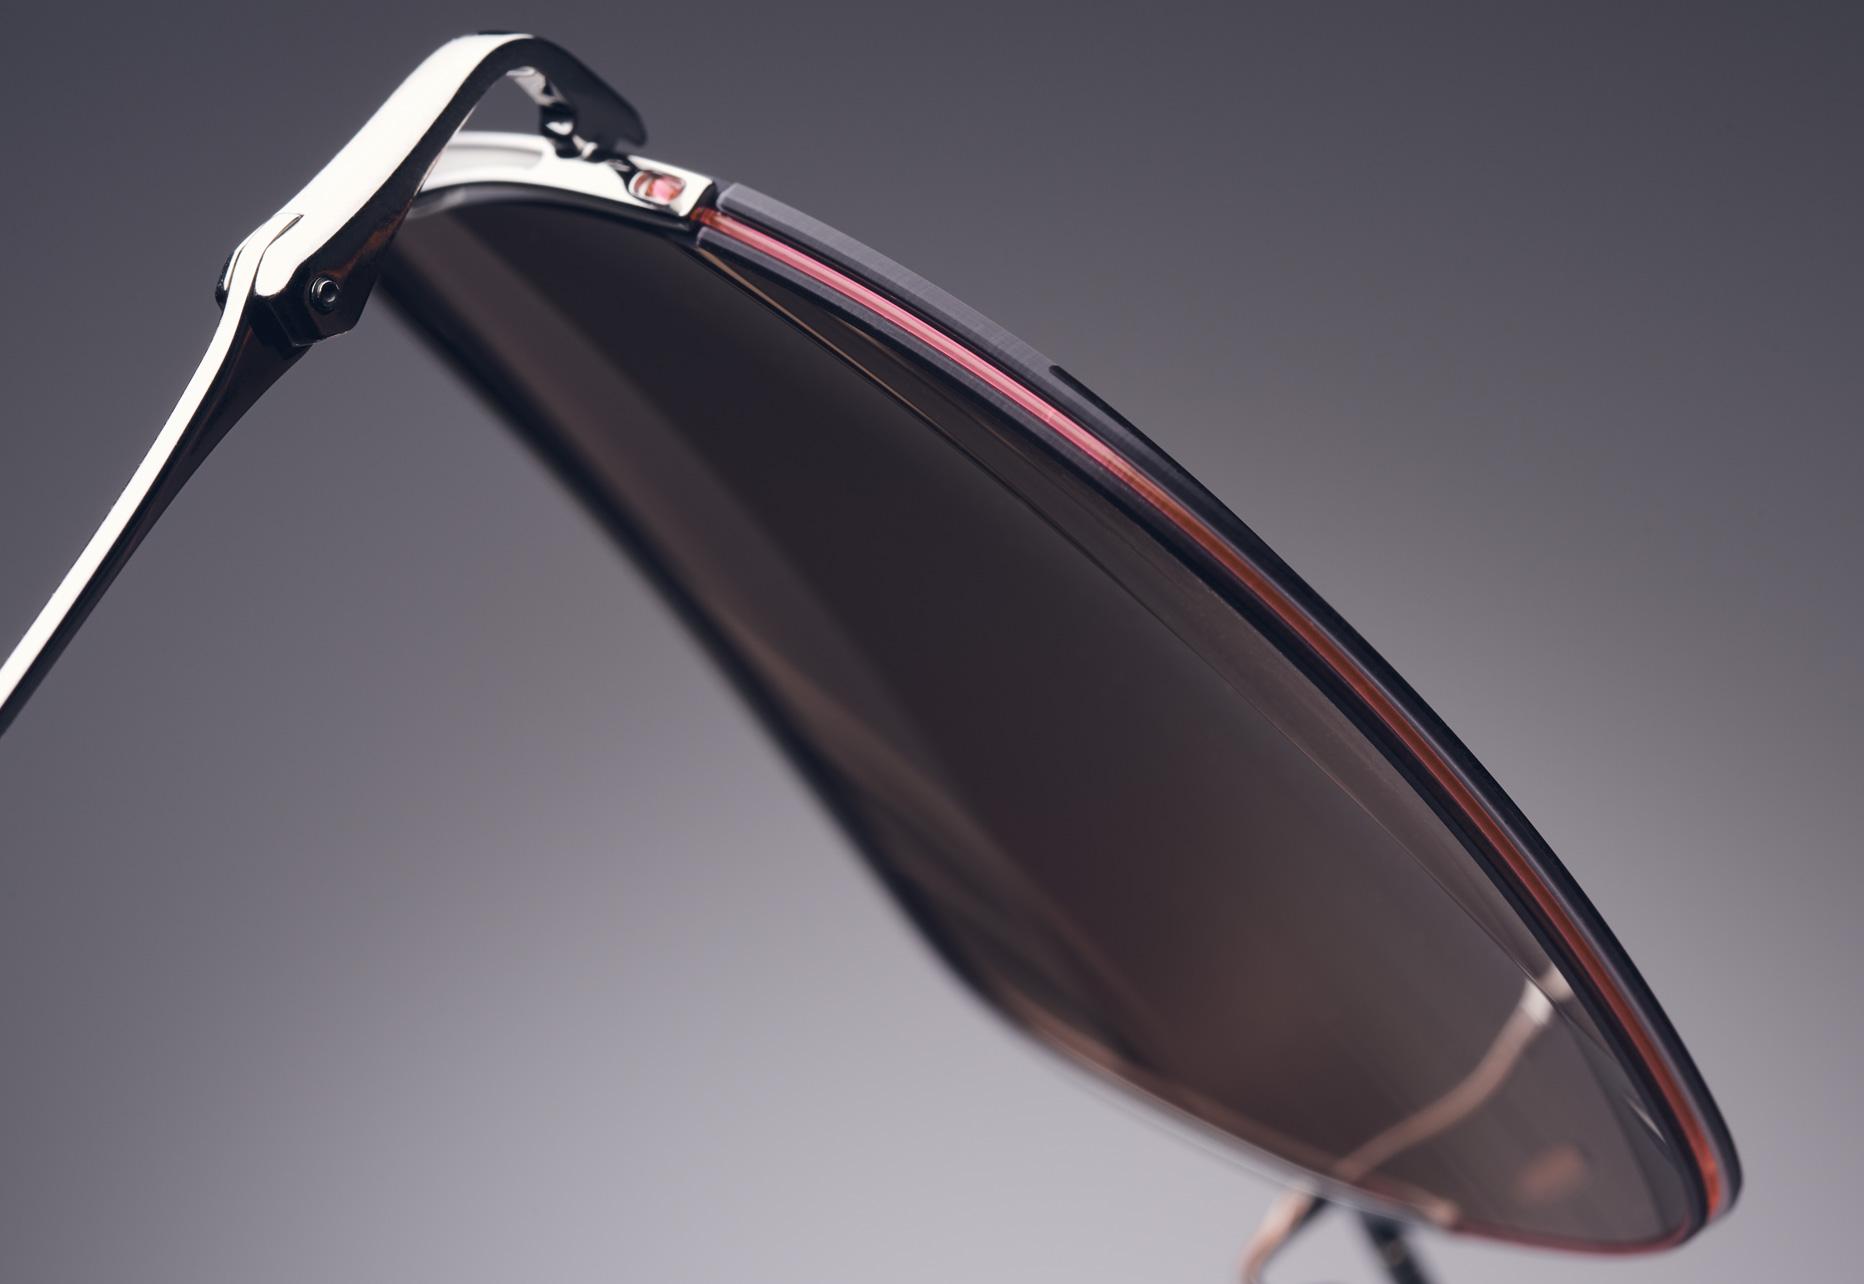 DITA METAMAT ULTRA FLEXIBLE SEMI RIMLESS TITANIUM FRAME DESIGNED FOR ENHANCED COMFORT